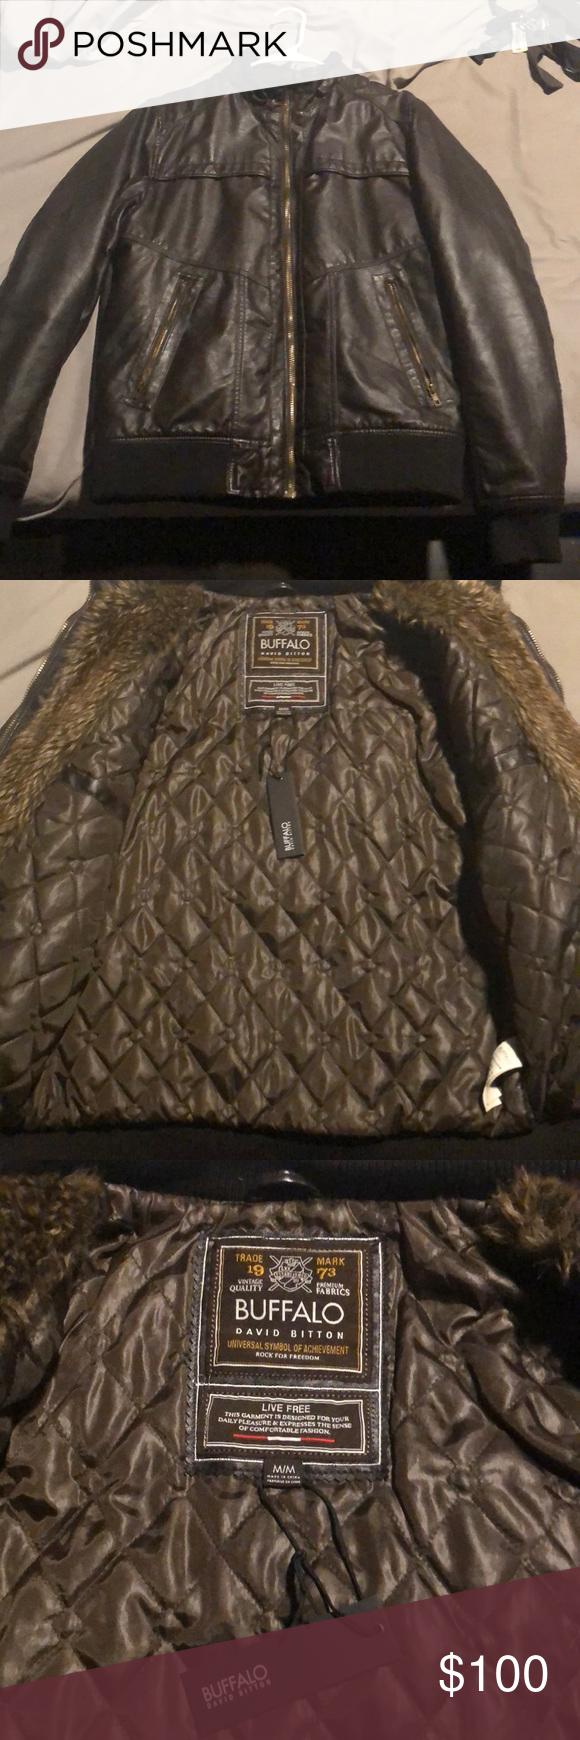 Buffalo David Bitton Jacket Vintage Edition Jackets Buffalo David Bitton Fashion [ 1740 x 580 Pixel ]